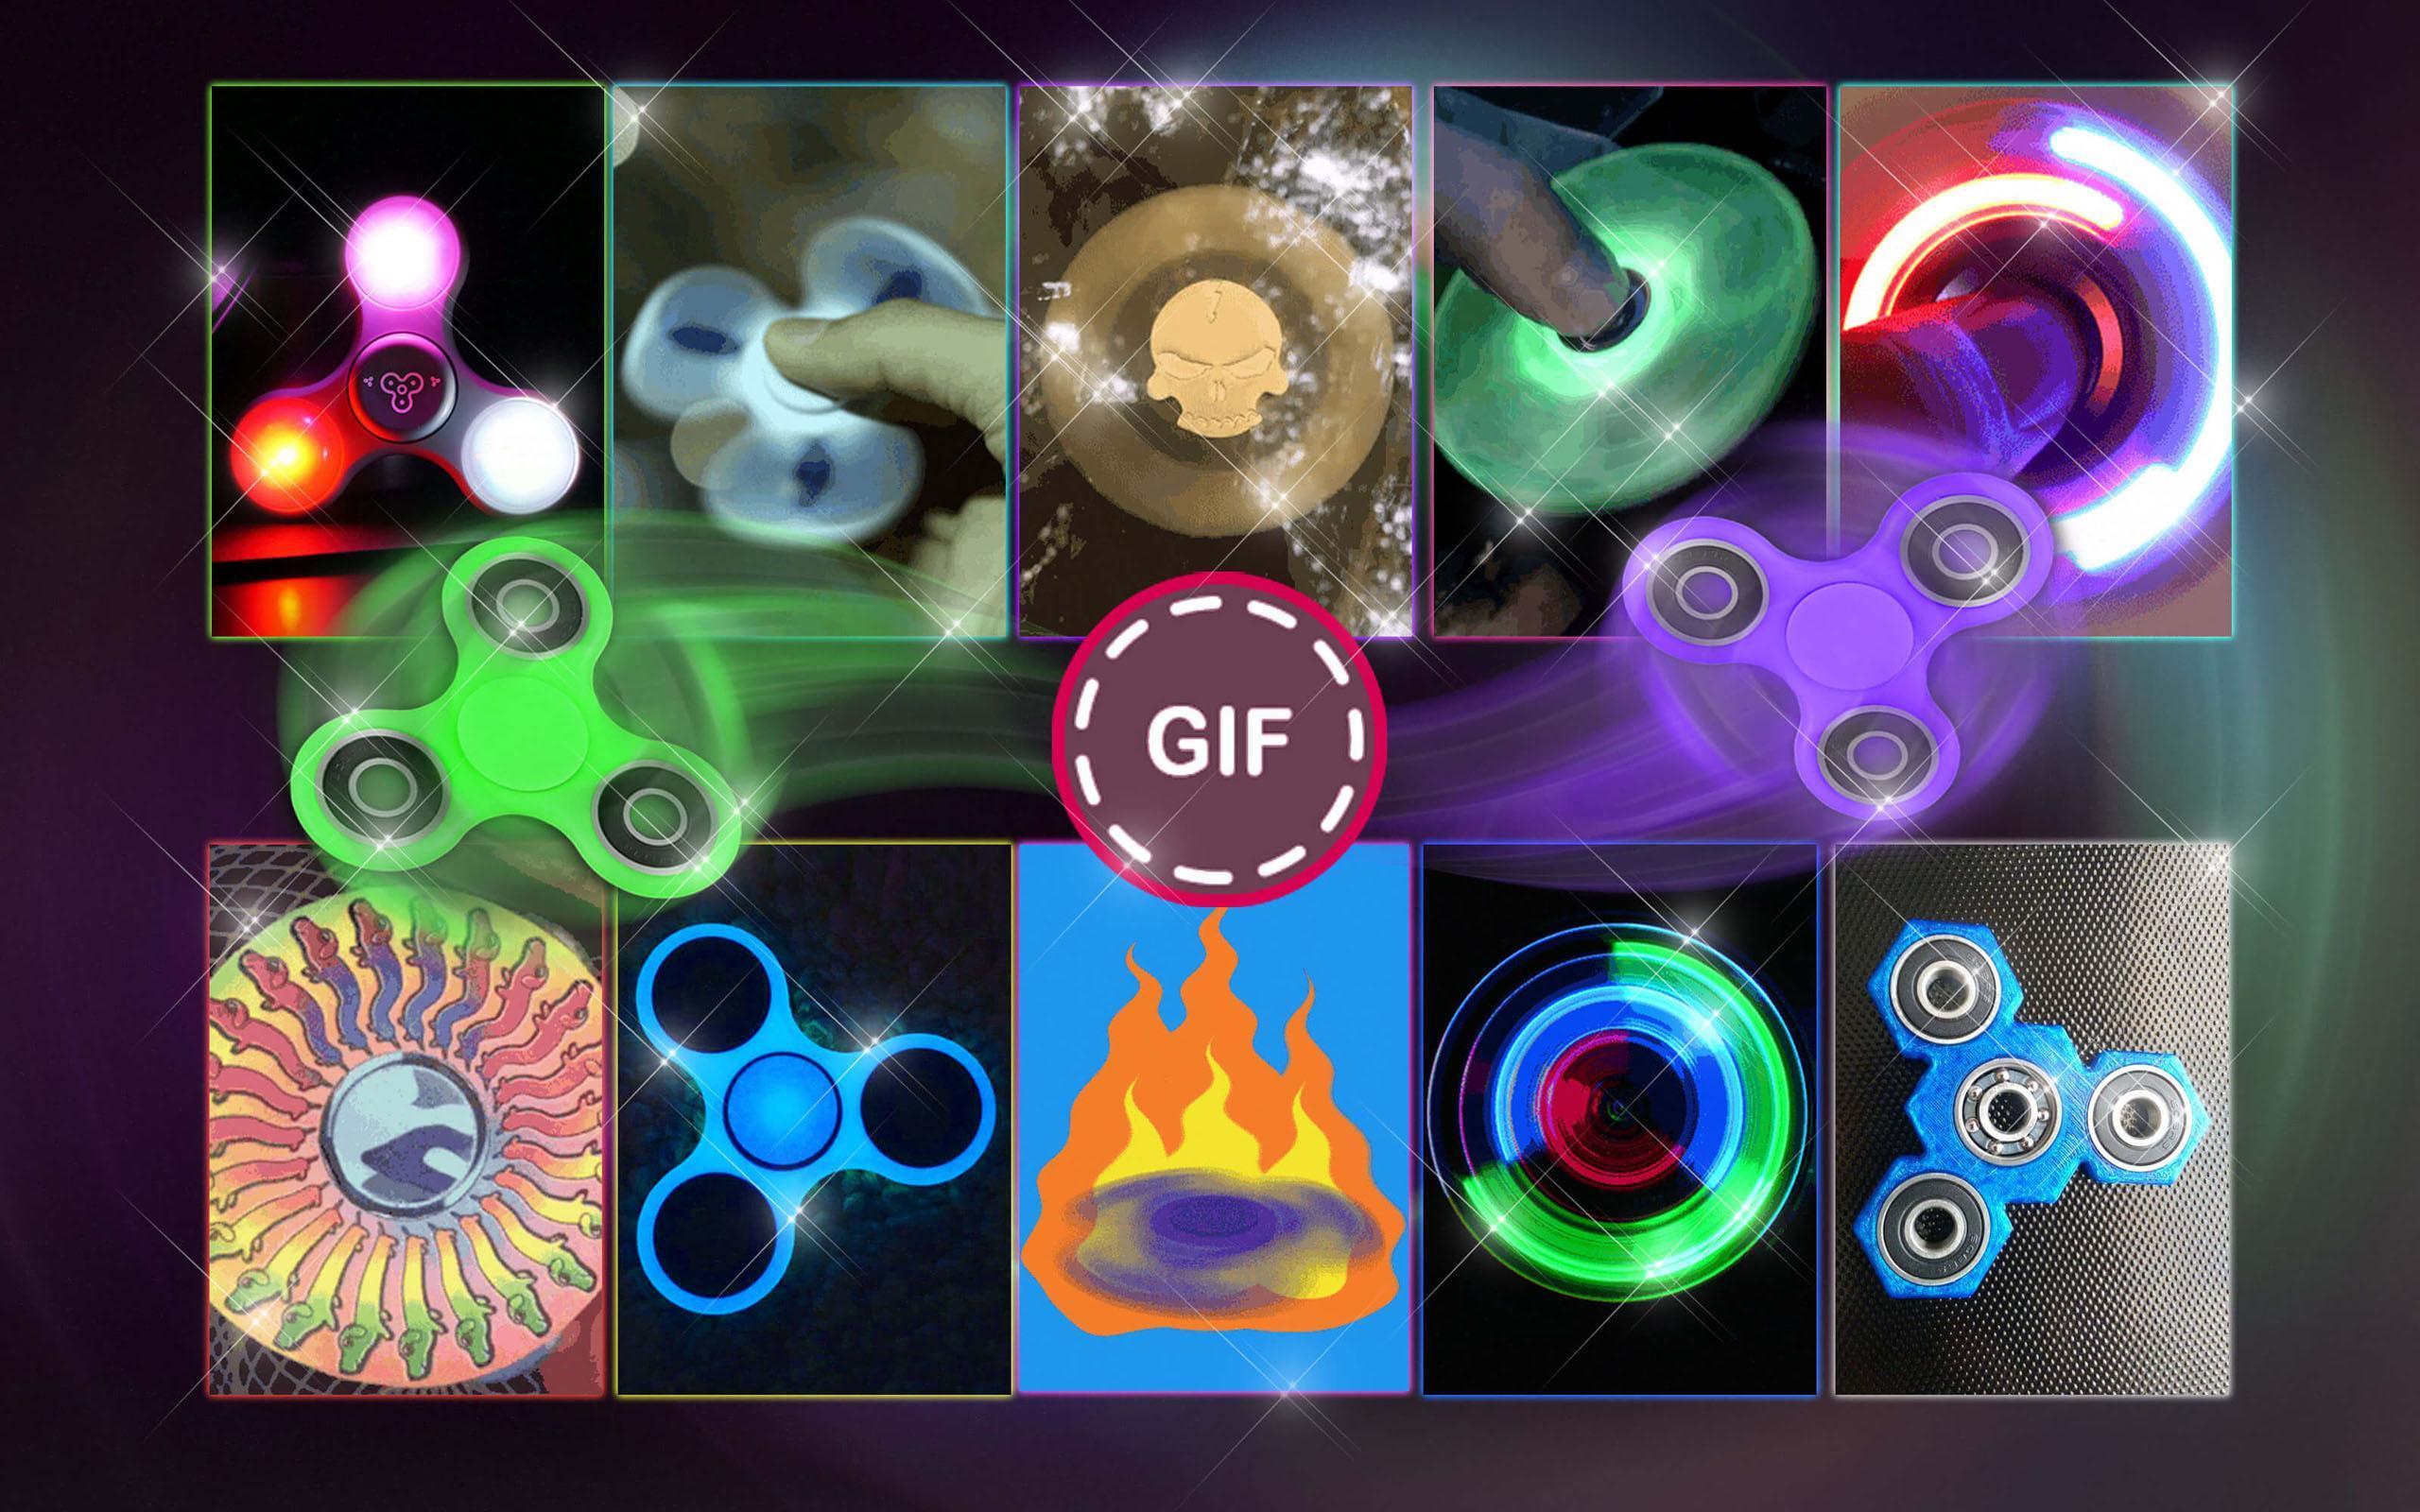 Pemintal Gelisah Layar Kunci ß· GIF Gambar Lucu For Android